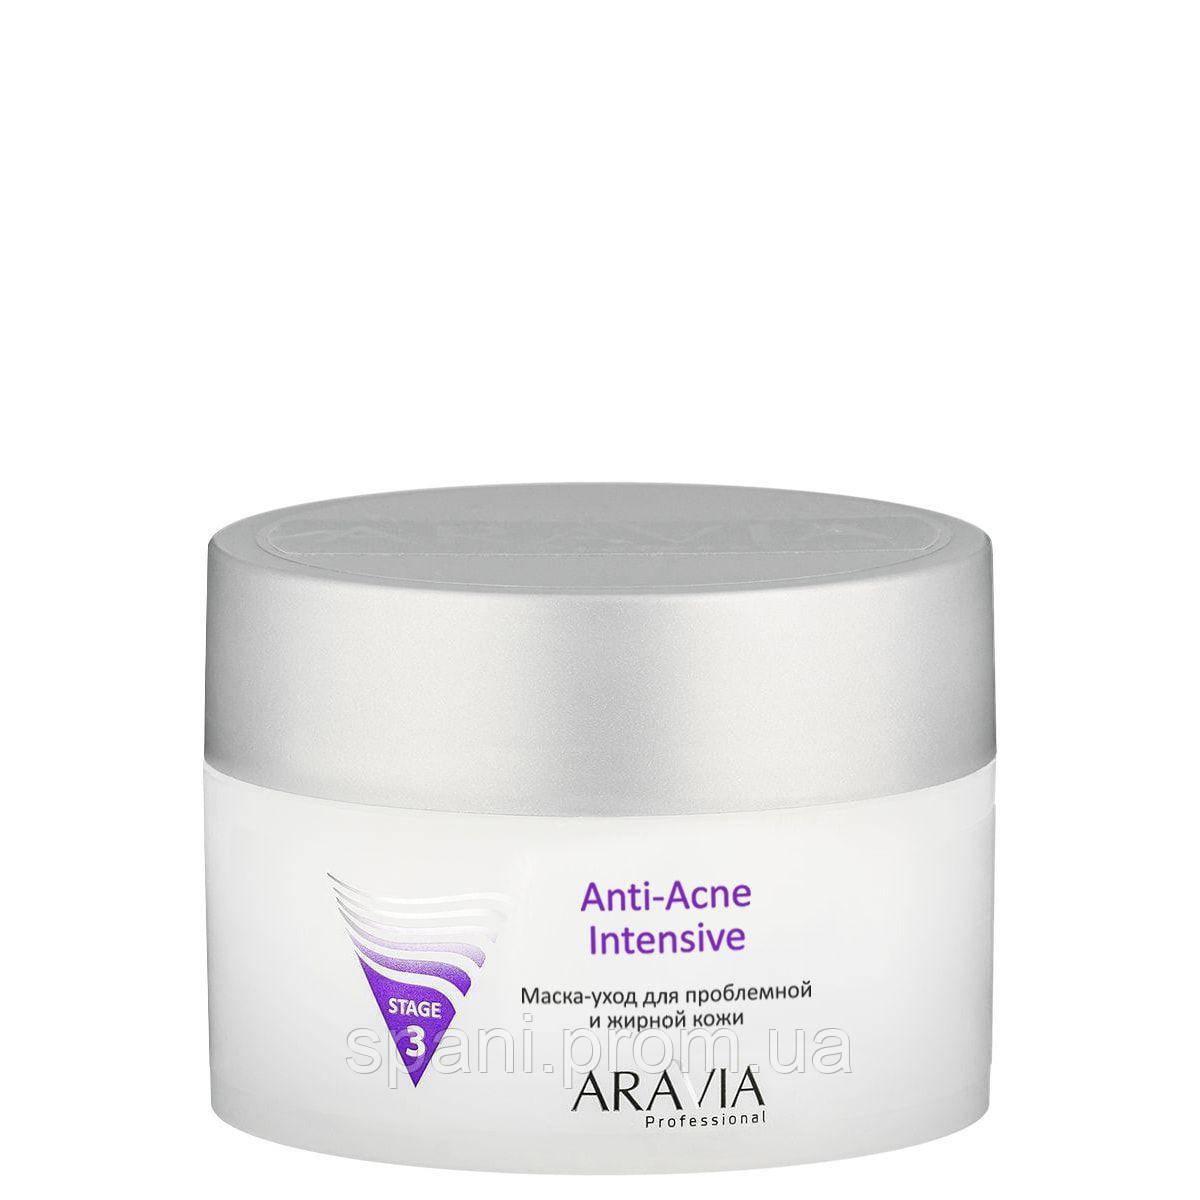 """ARAVIA Professional"" Маска-догляд для проблемної та жирної шкіри Anti-Acne Intensive, 150 мл."